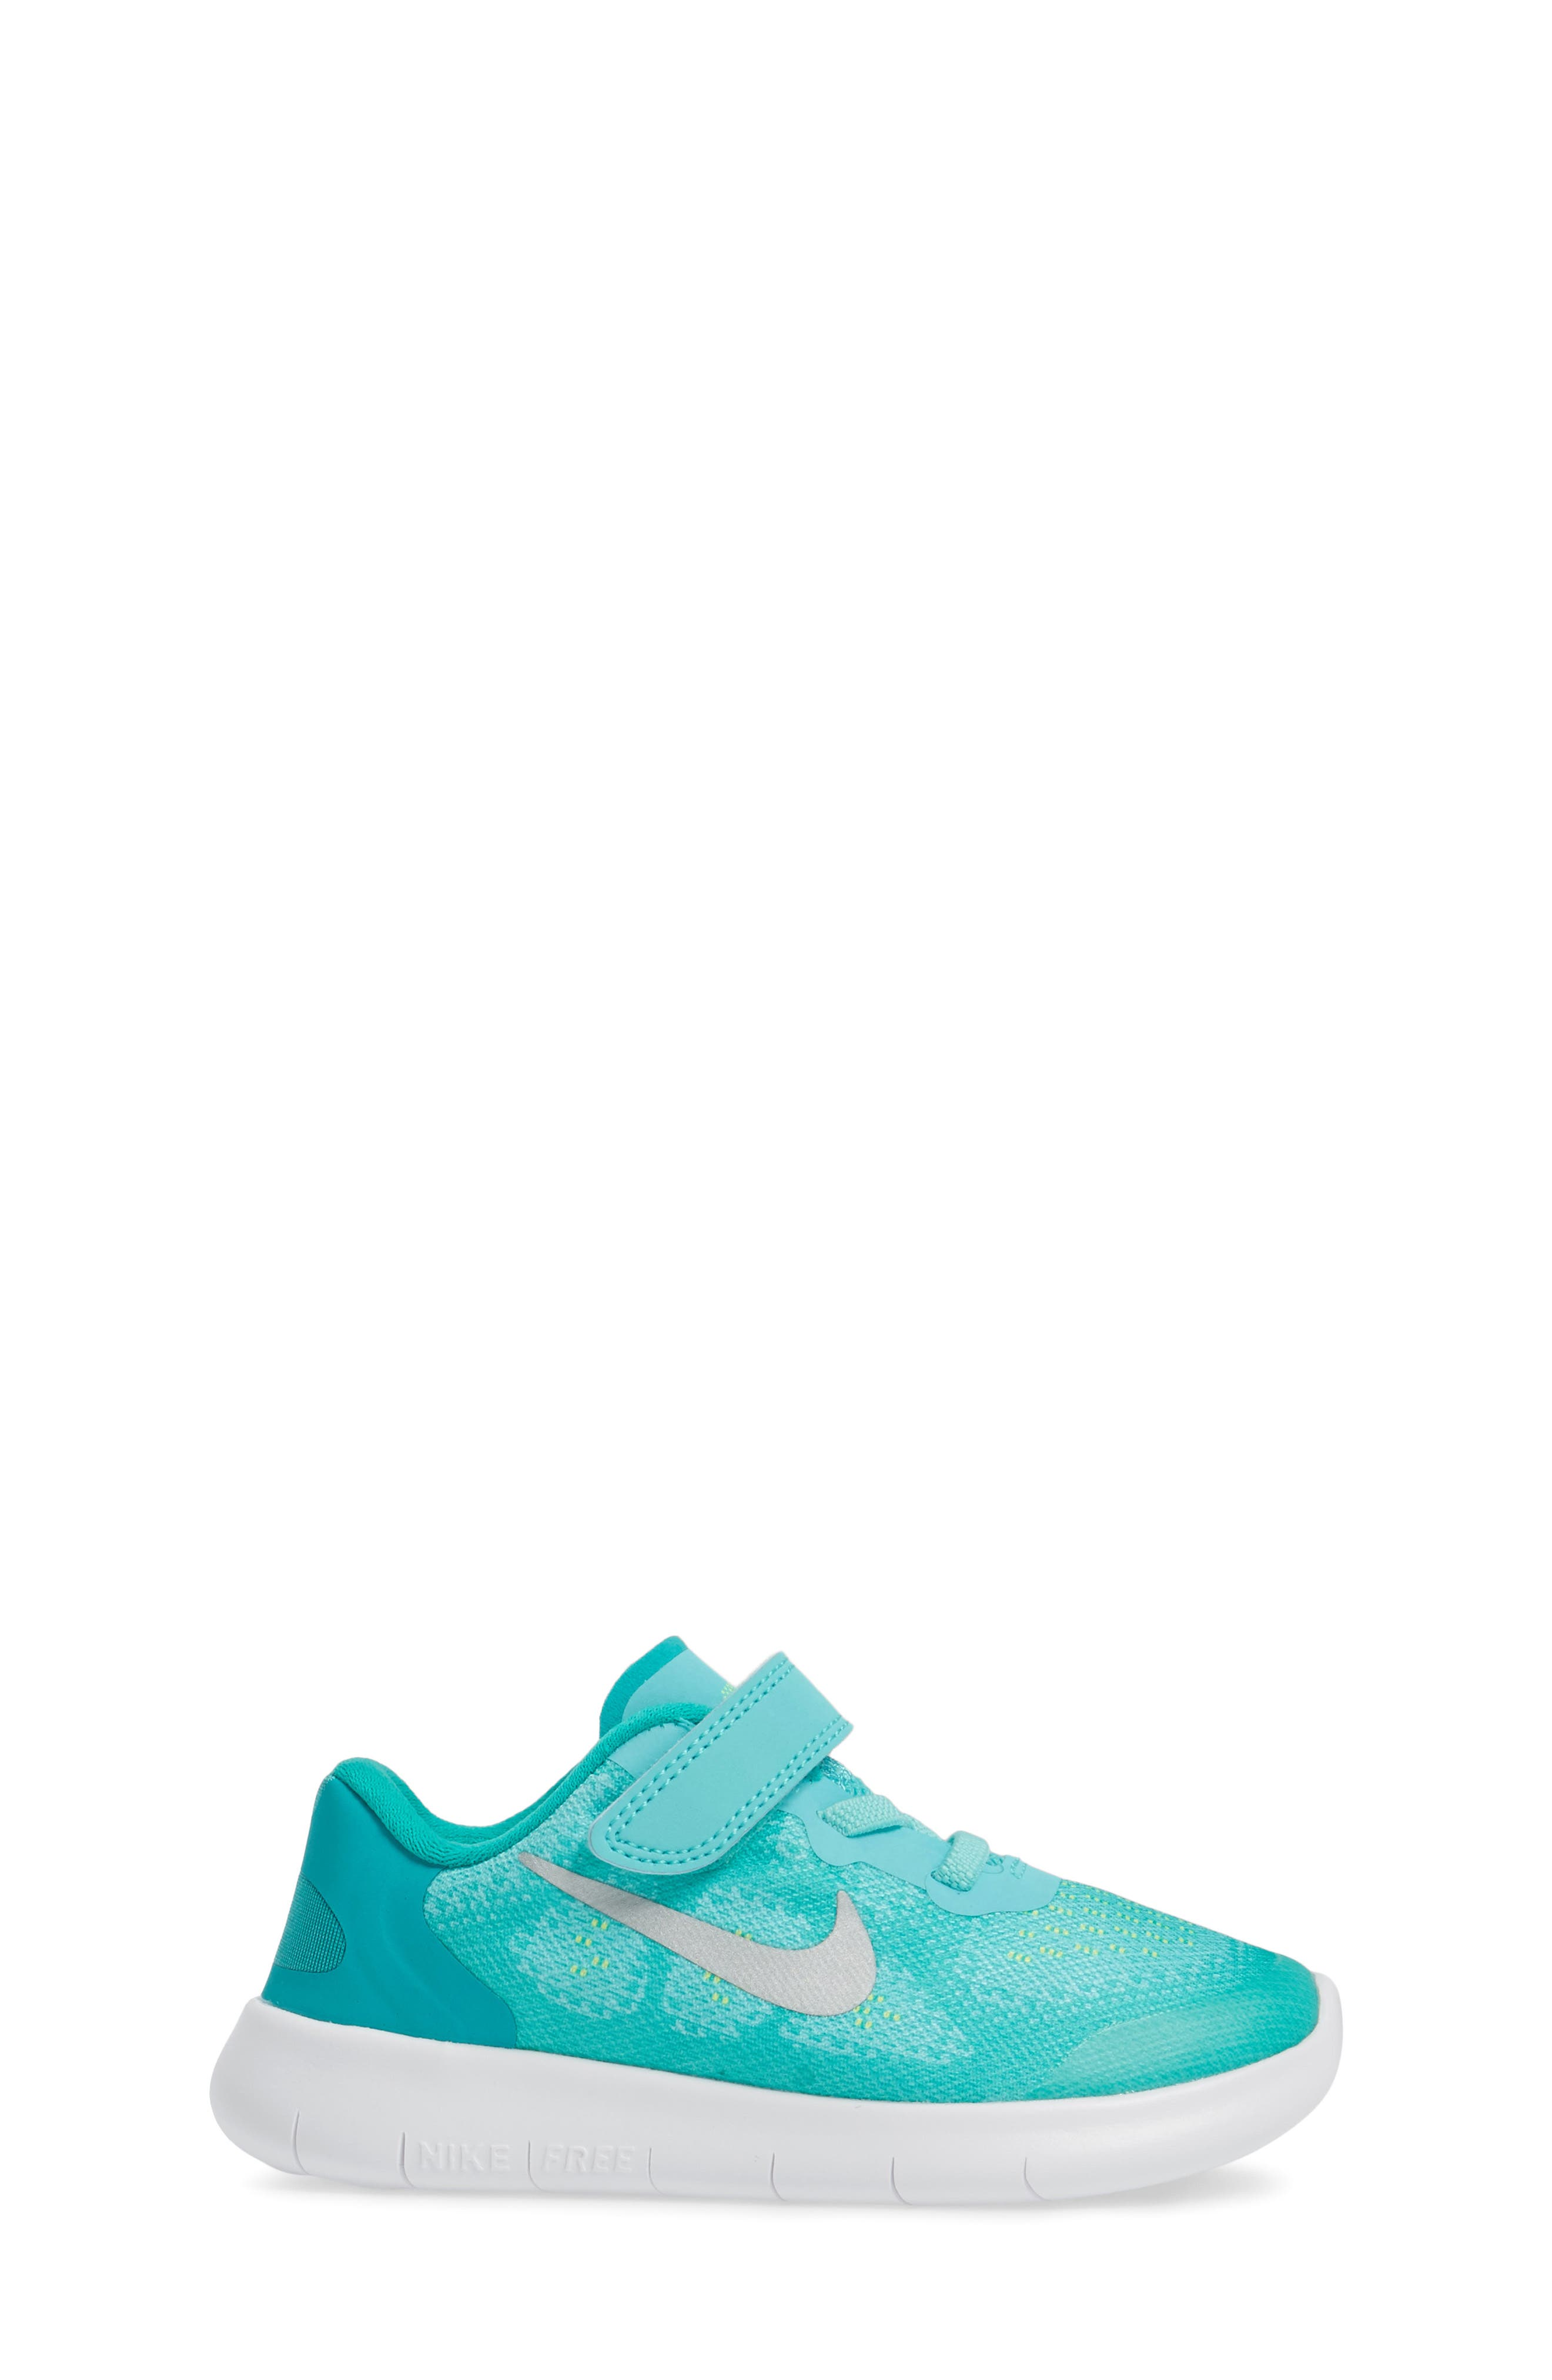 Free Run 2017 Sneaker,                             Alternate thumbnail 13, color,